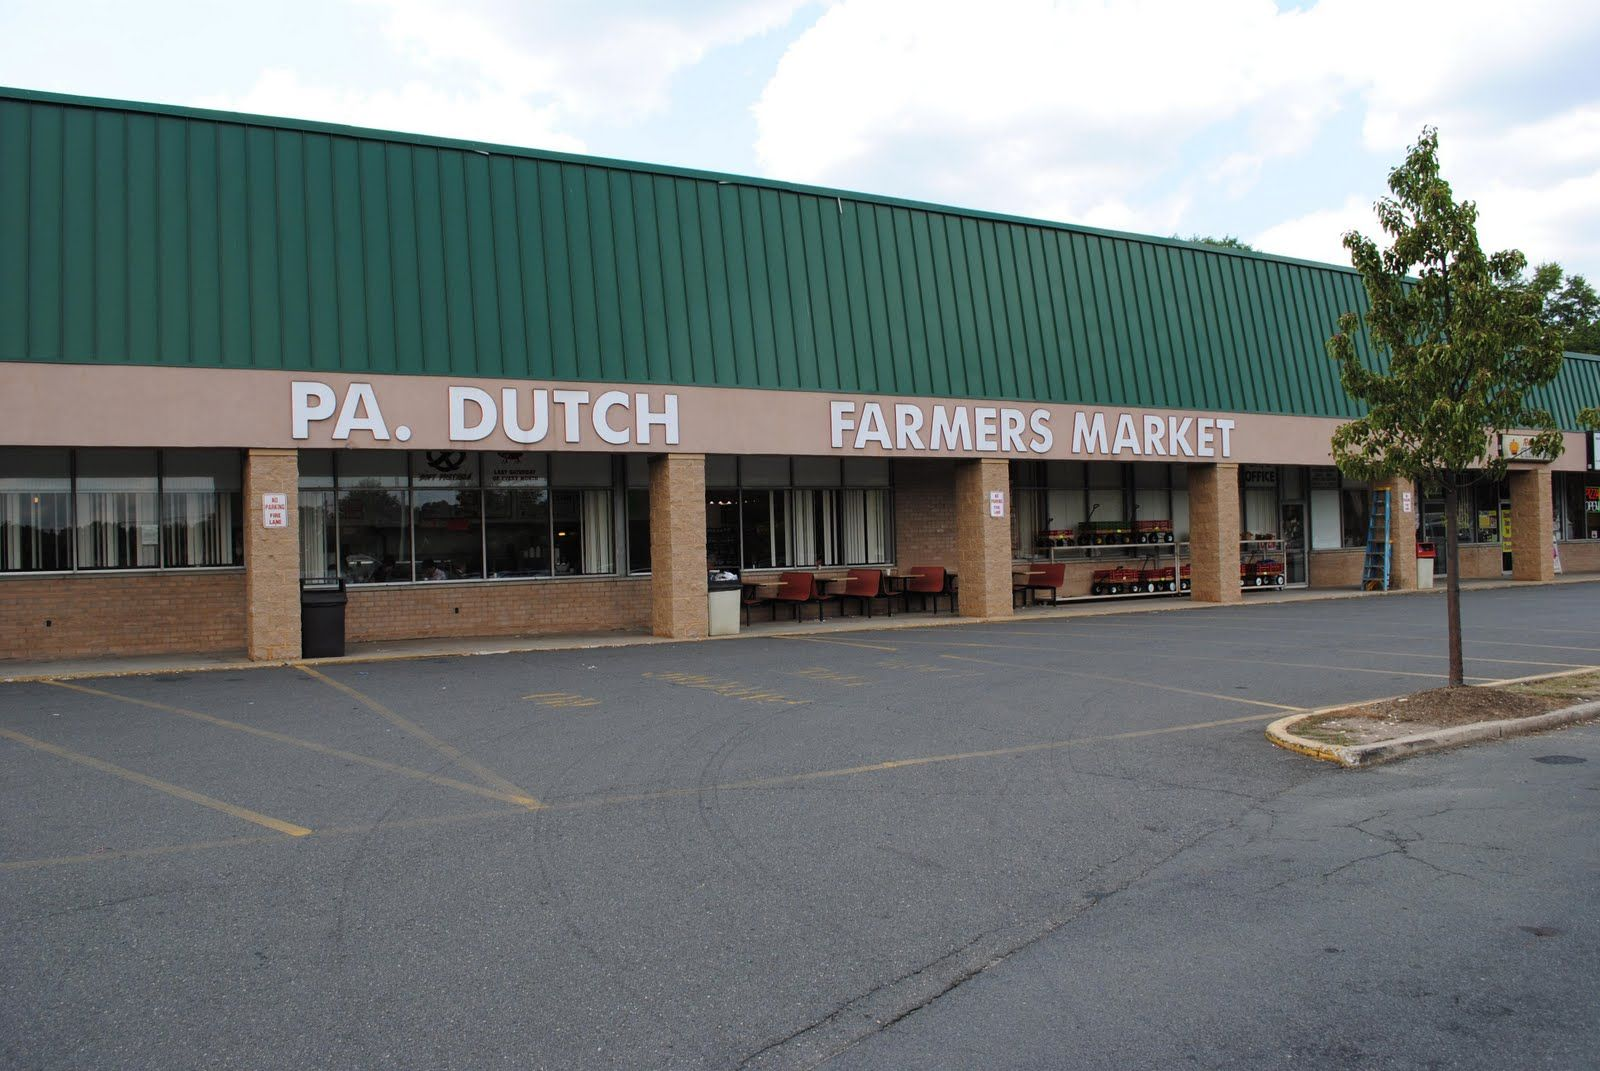 PA Dutch Farmers Market, 4437 Route 27, Kingston, NJ